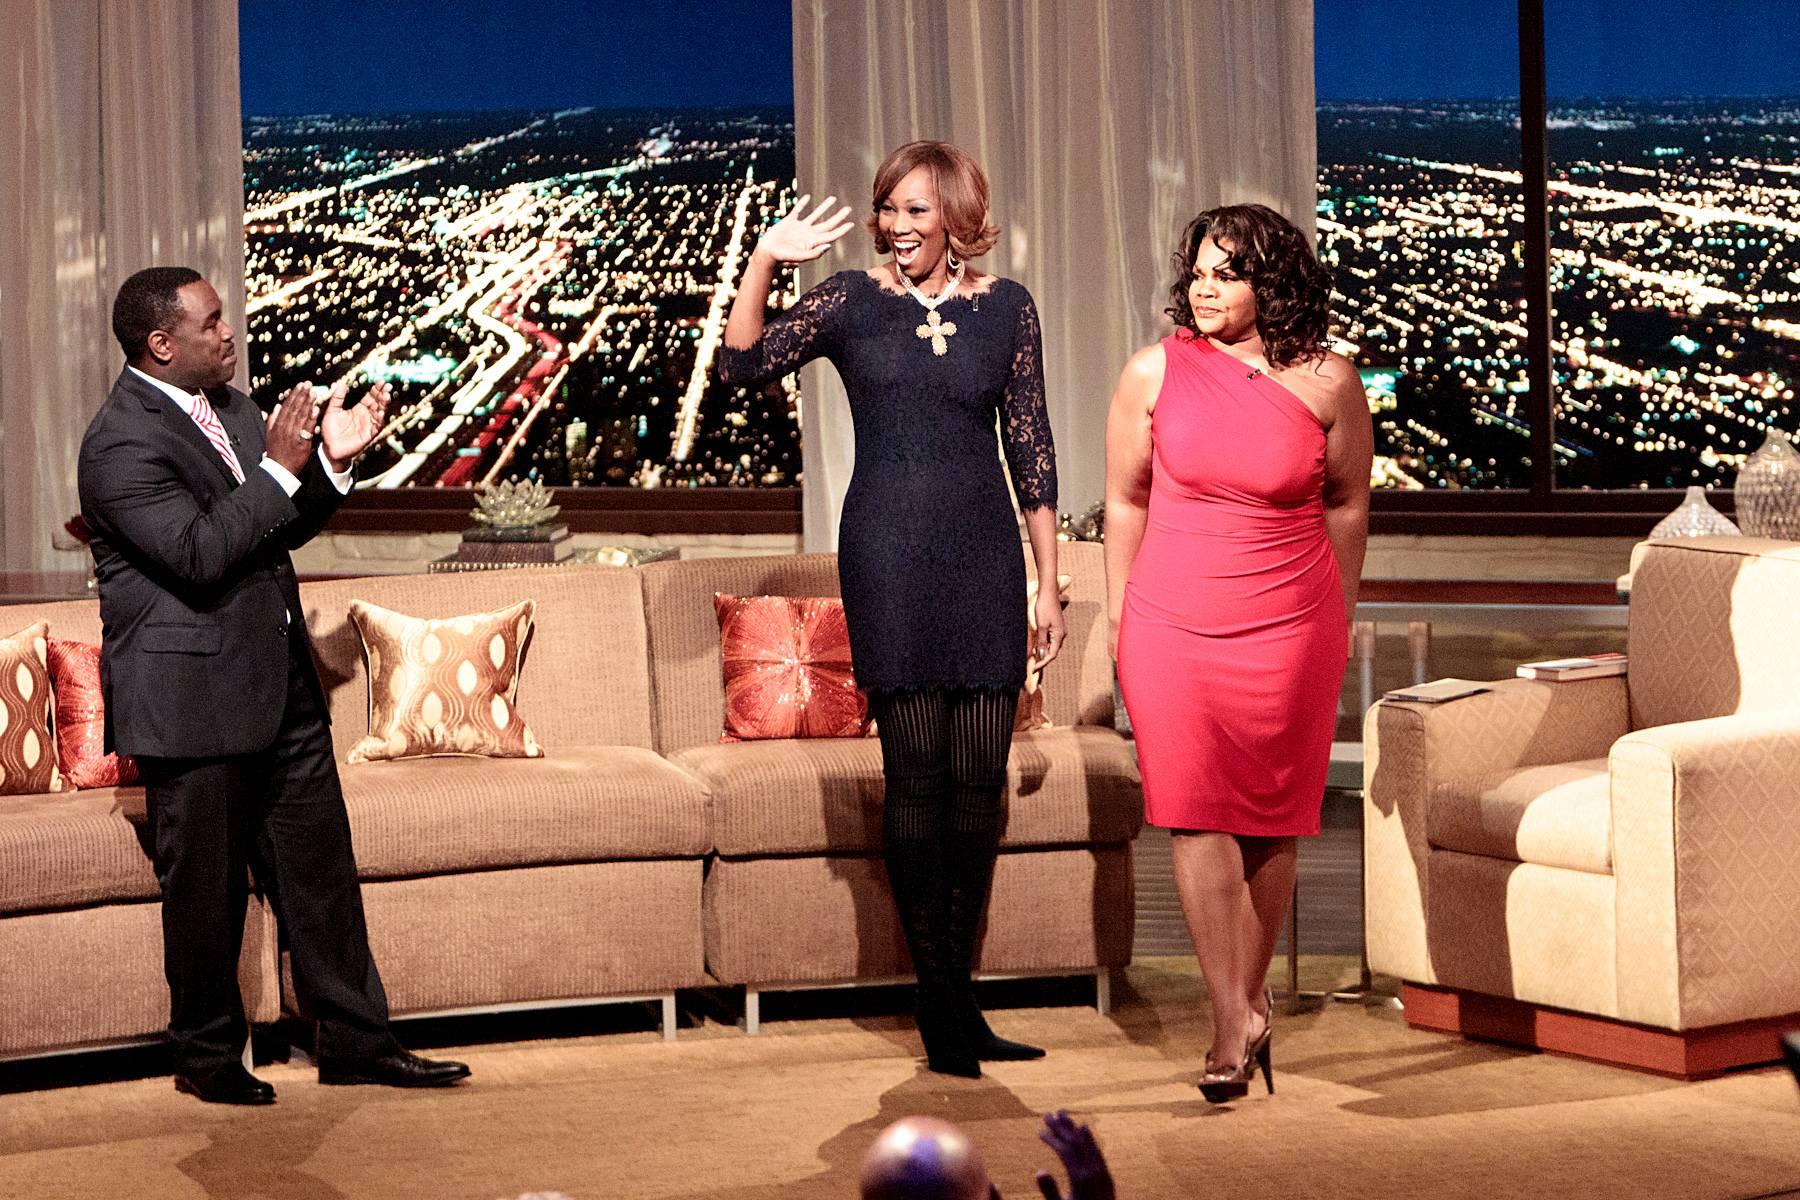 Praiseworthy - Gospel superstar Yolanda Adams enters the Penthouse to much rejoice!(Photo: Darnell Williams/BET)